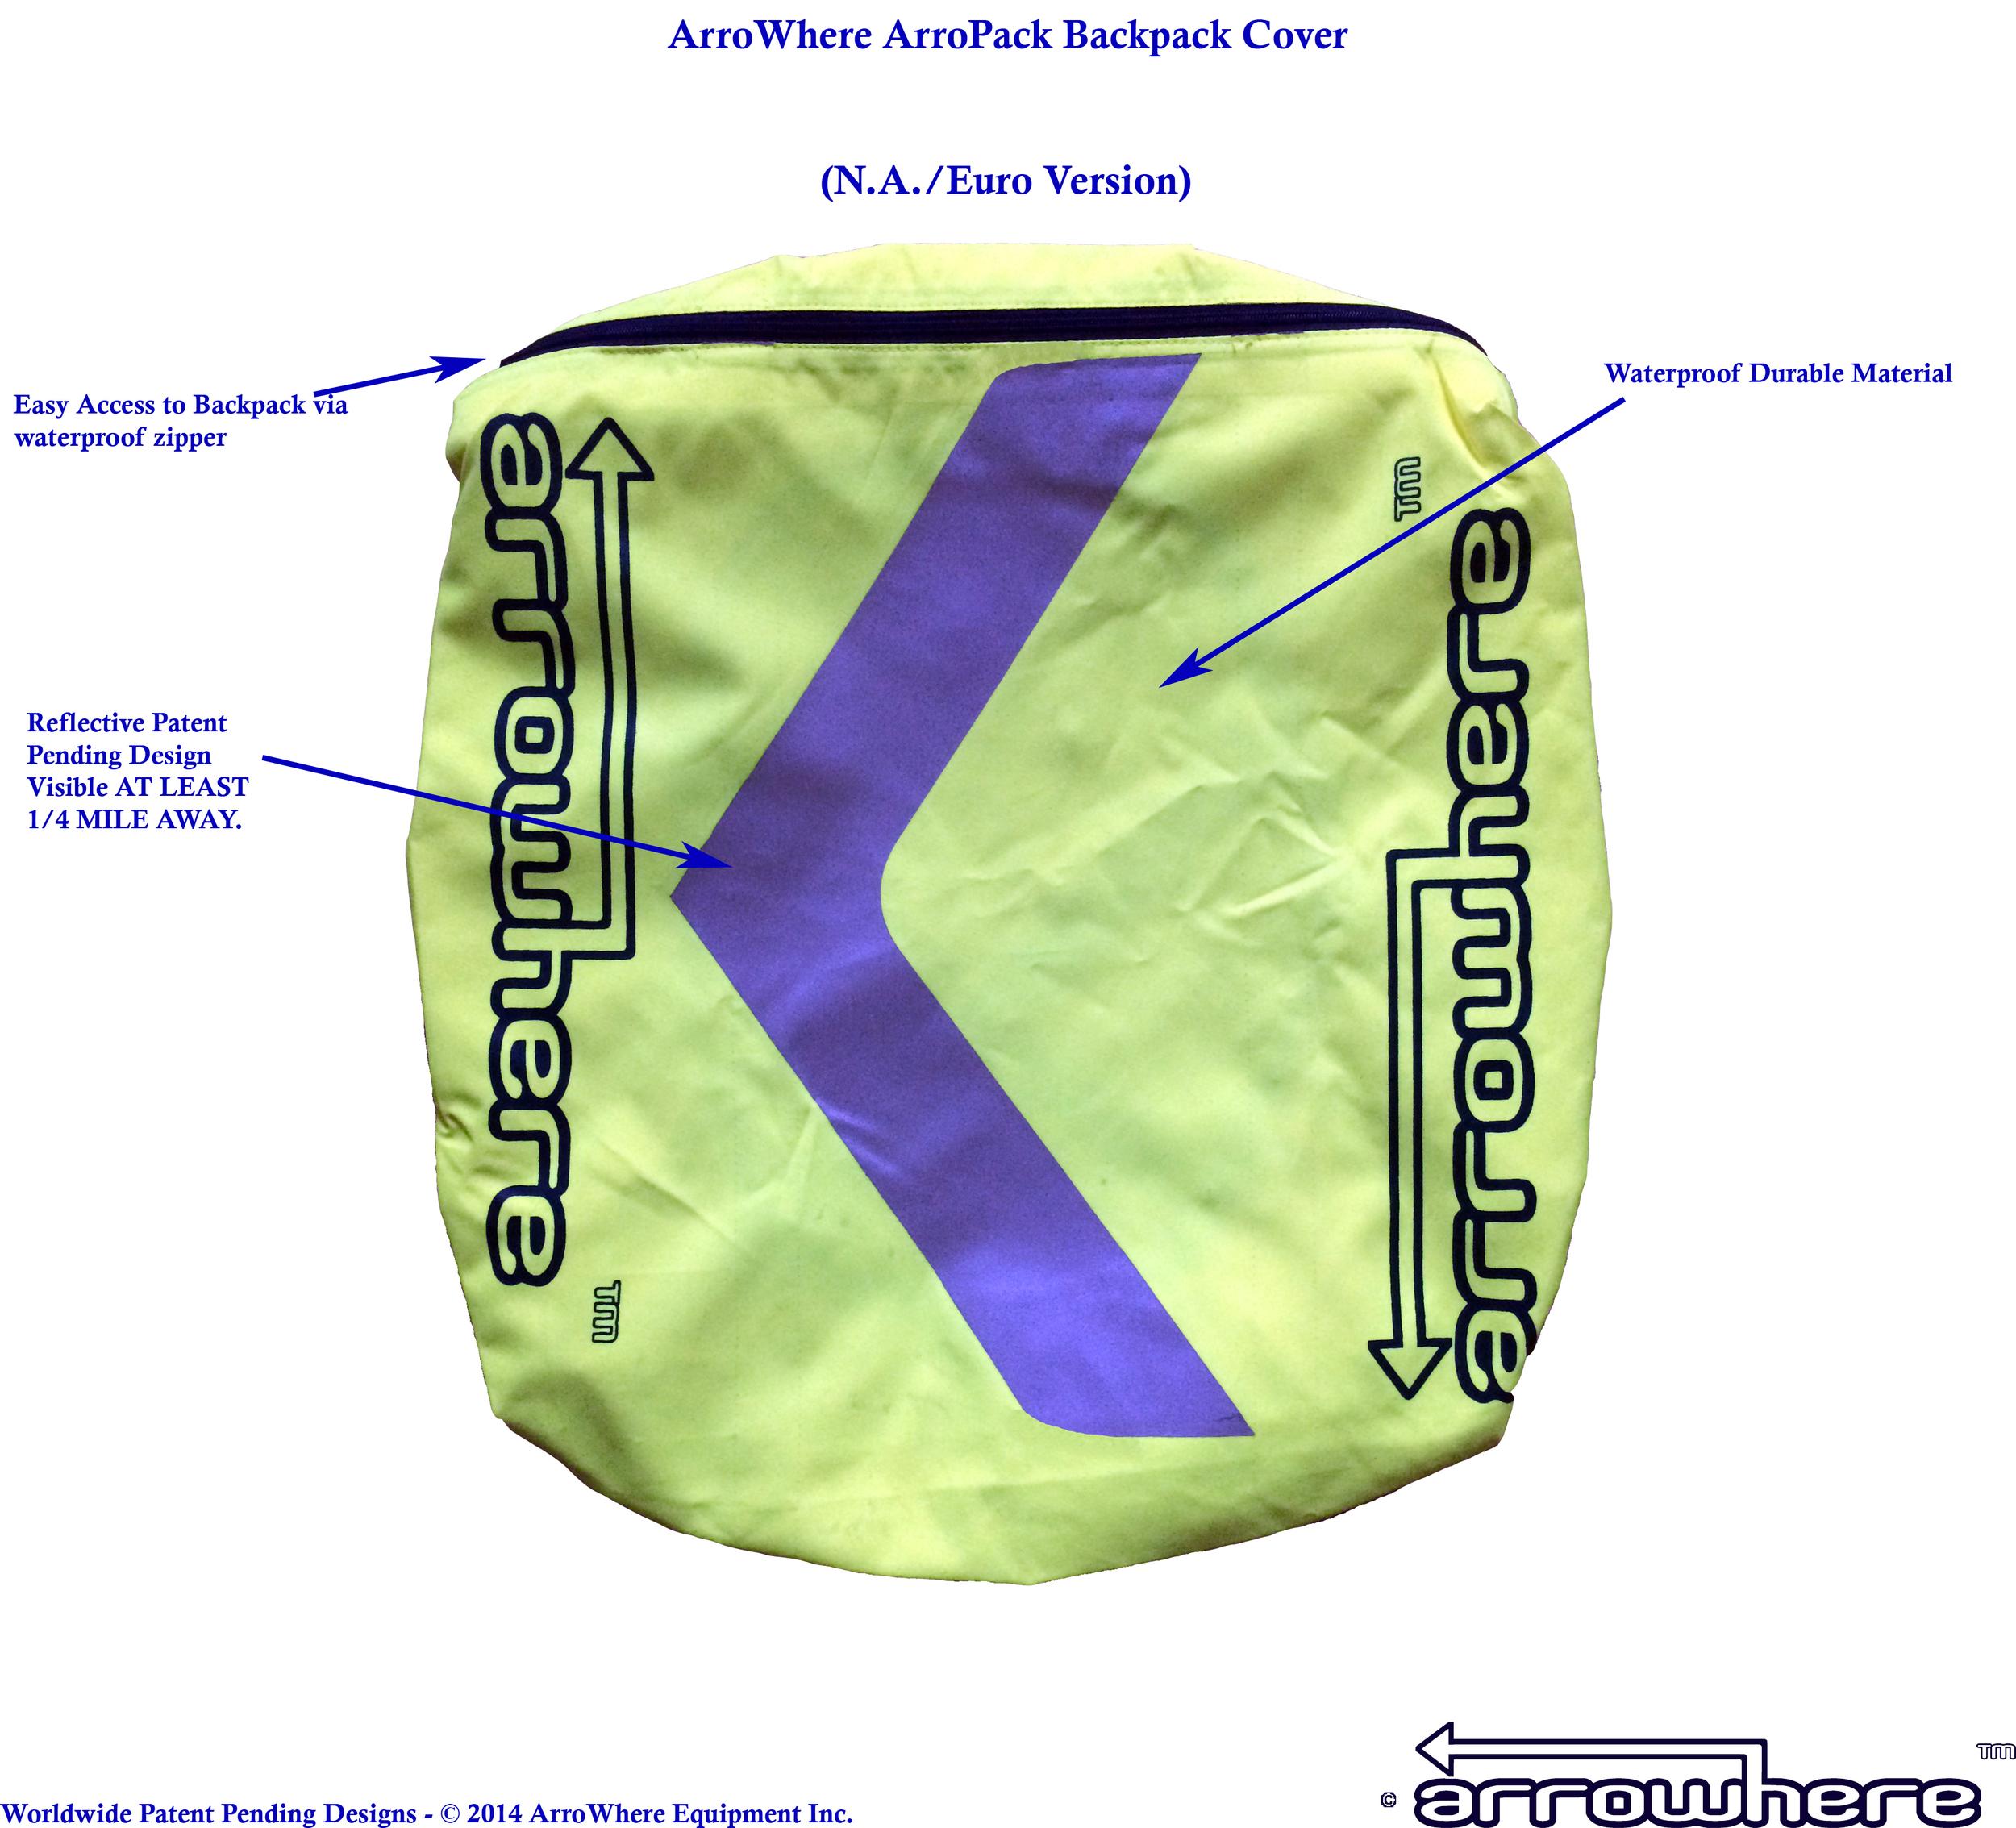 ArroWhere Equipment Inc. ArroPack Backpack Cover Description